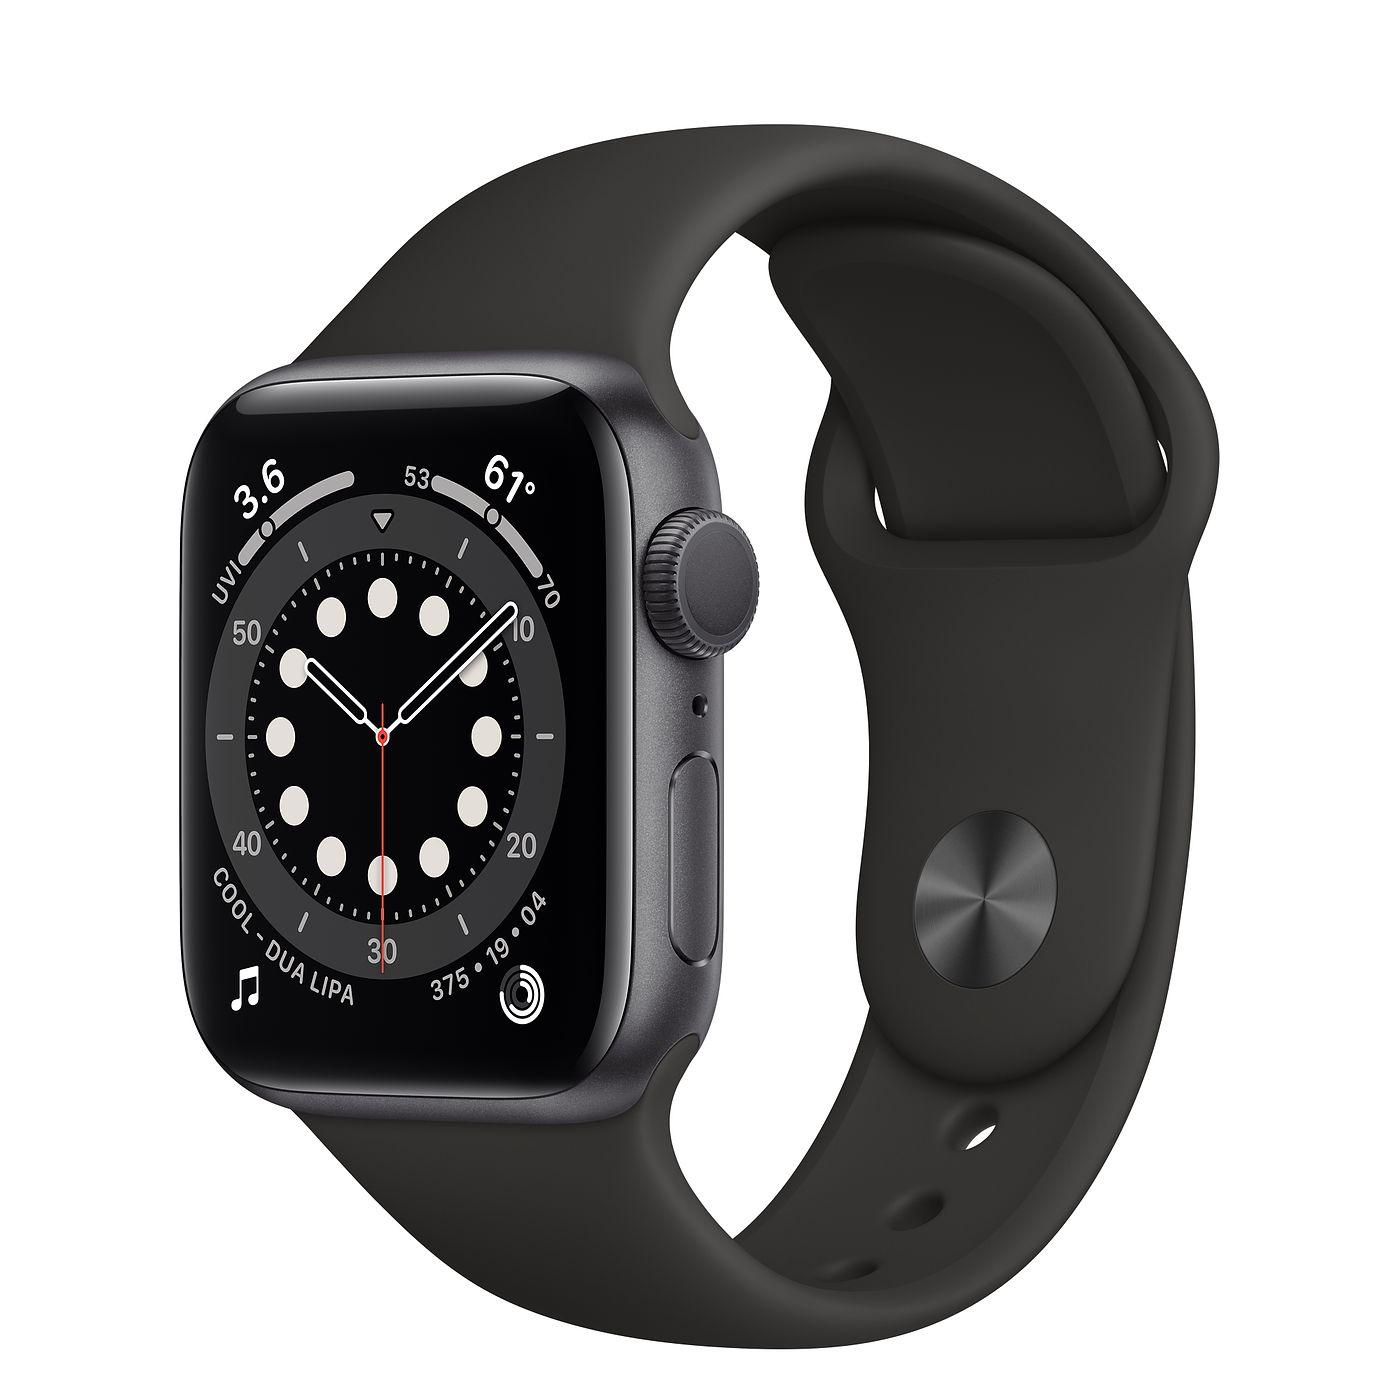 Apple 2020년 애플워치 6, GPS, 스페이스 그레이 알루미늄 케이스, 블랙 스포츠 밴드